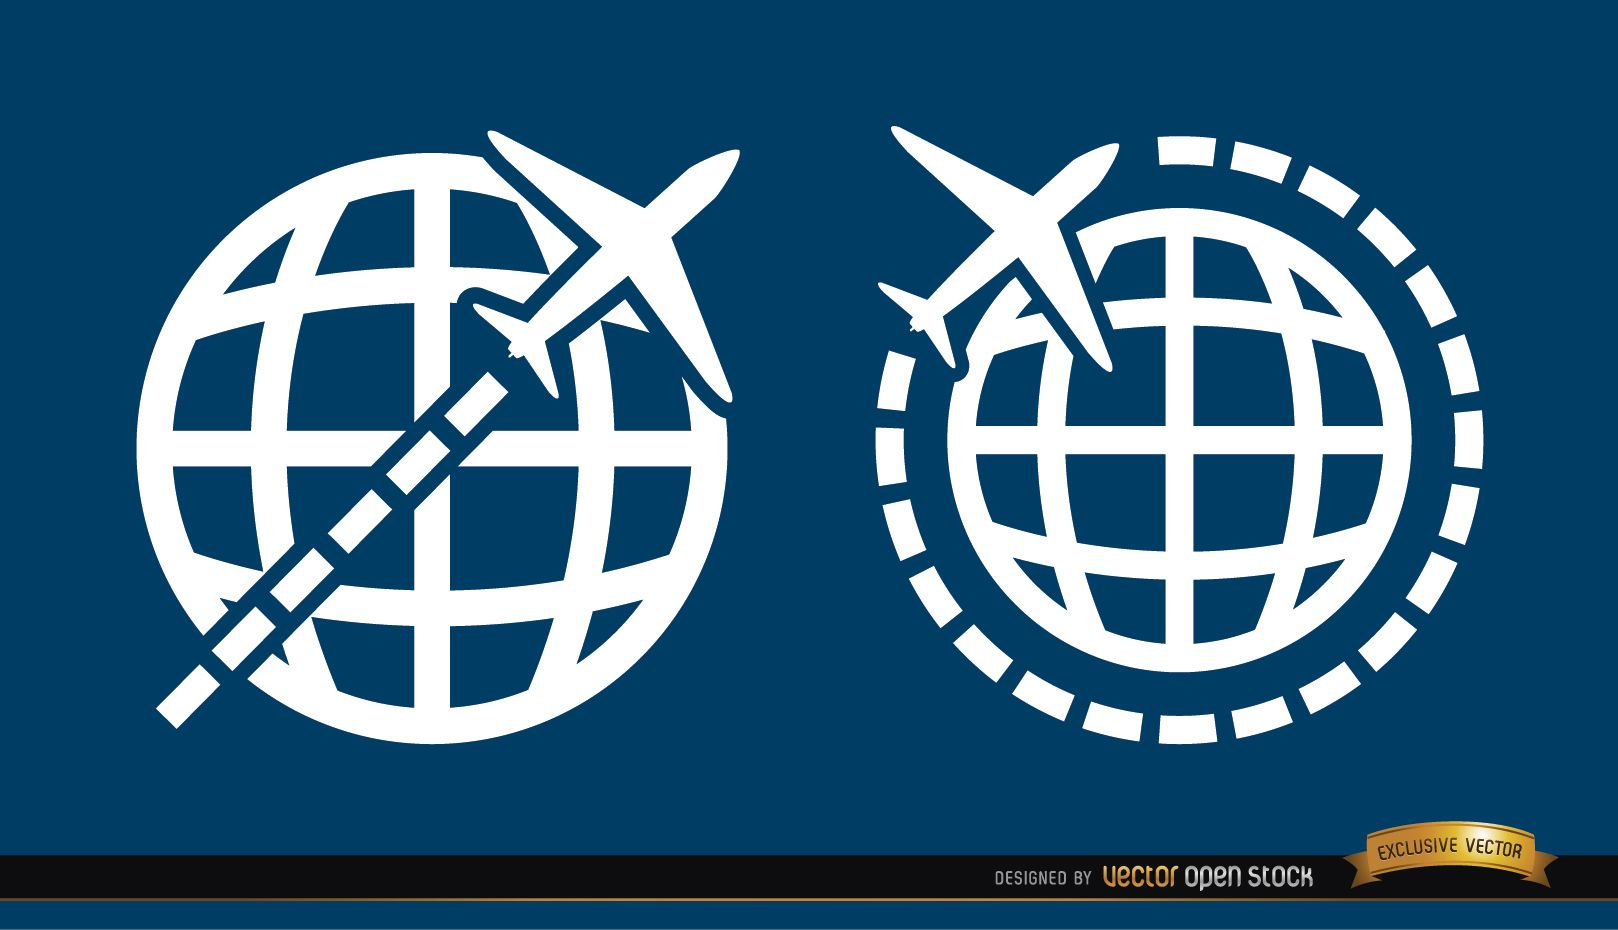 2 Travel around world symbols